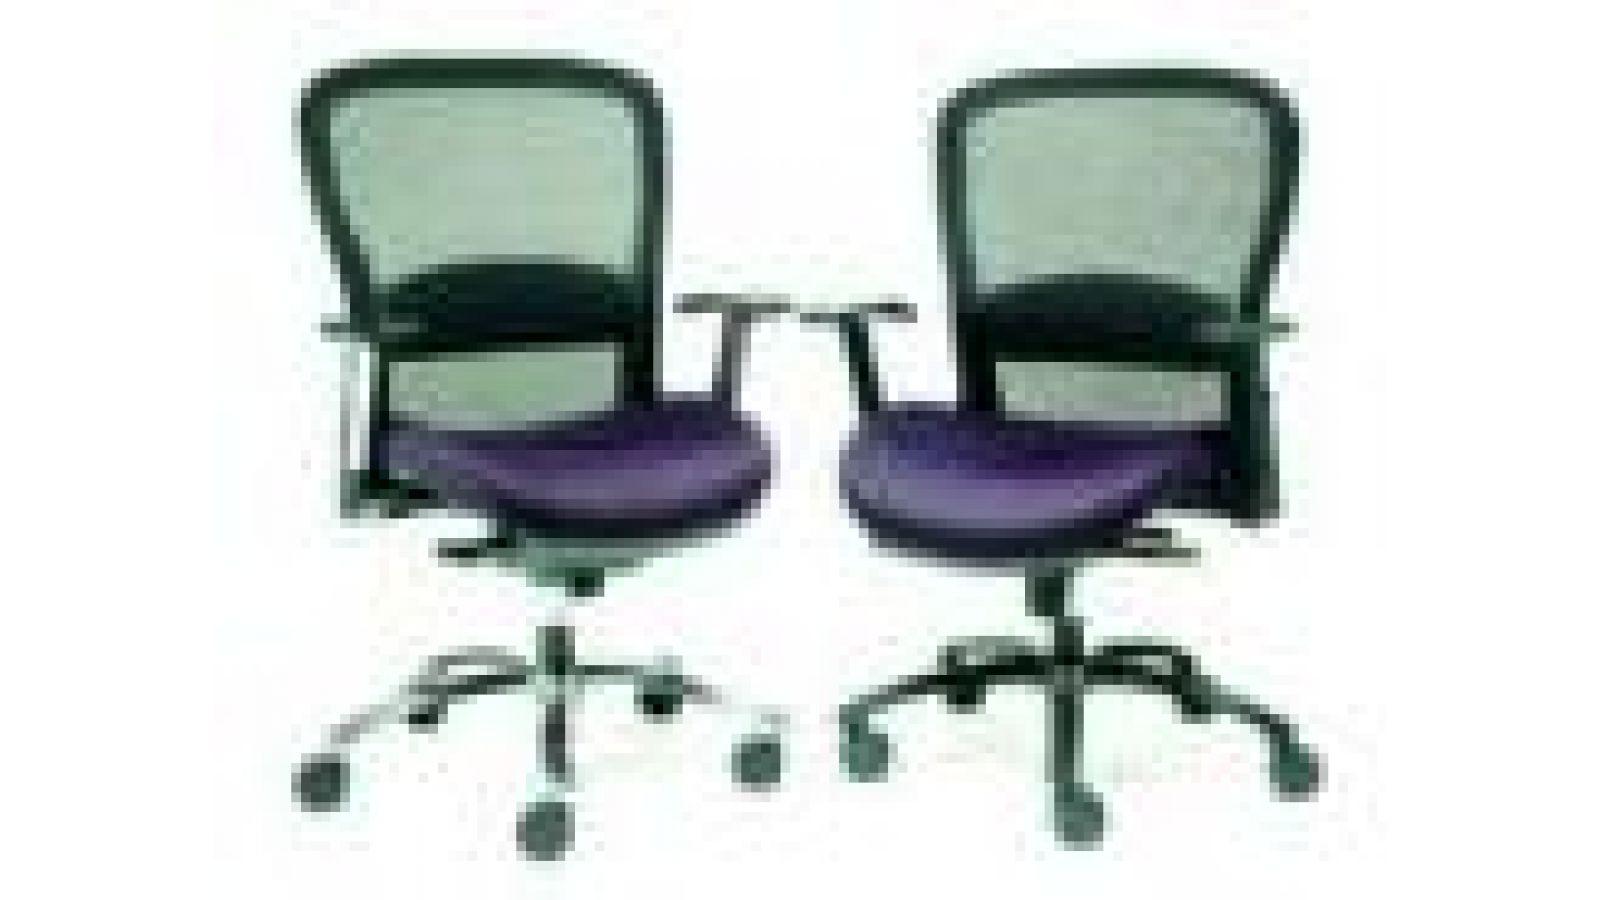 Echair Seating